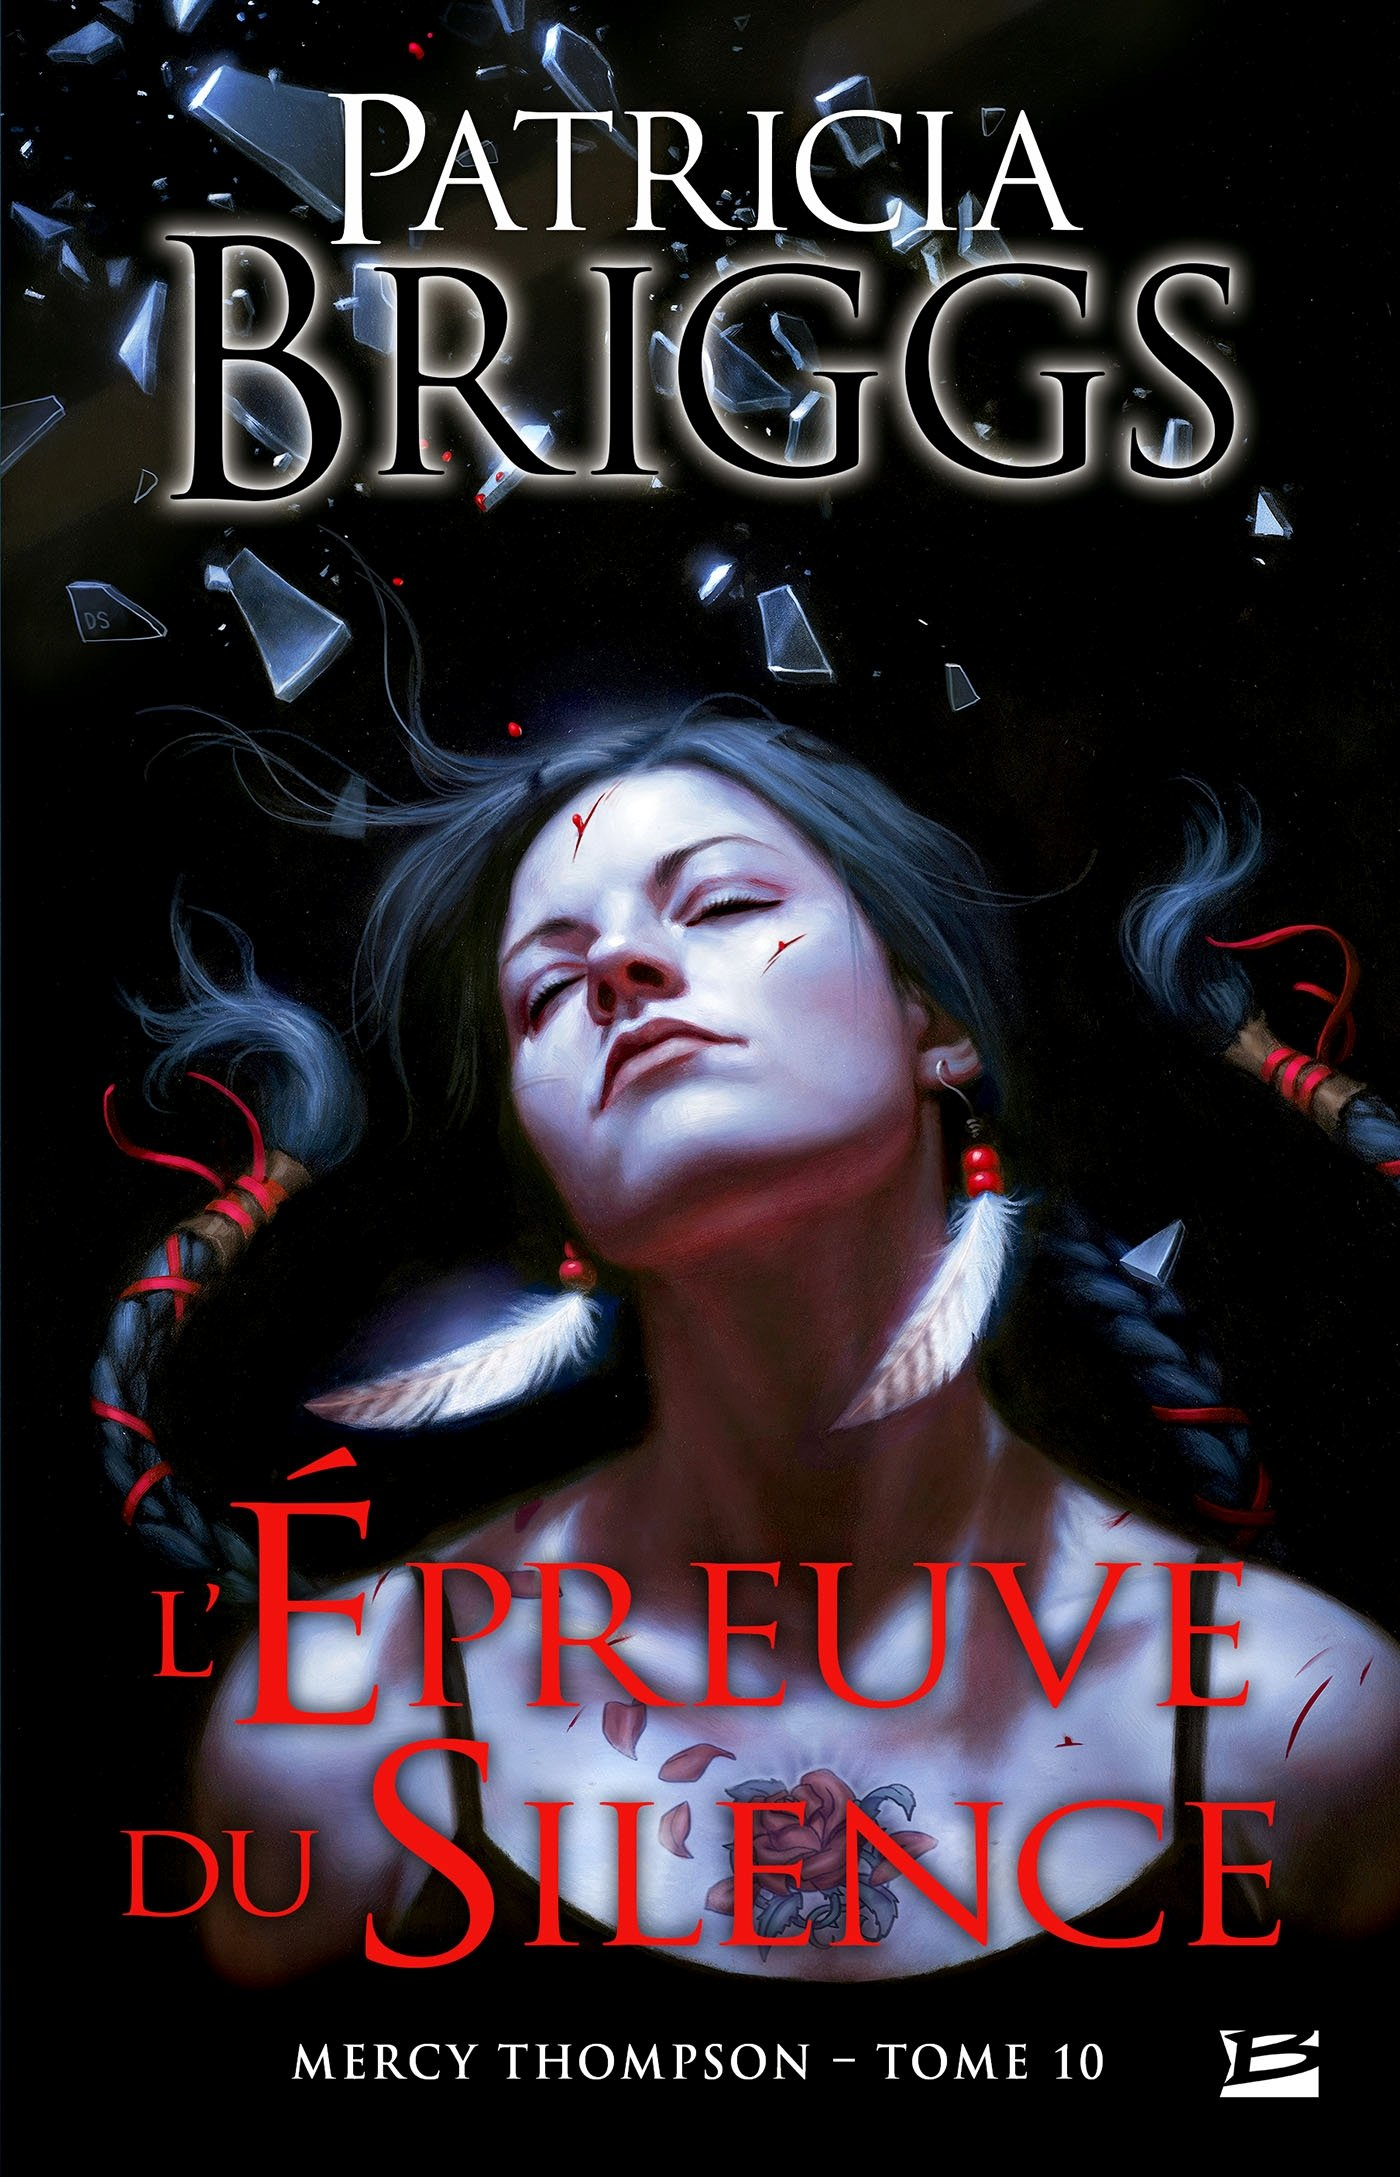 Patricia briggs mercy thompson pdf editor